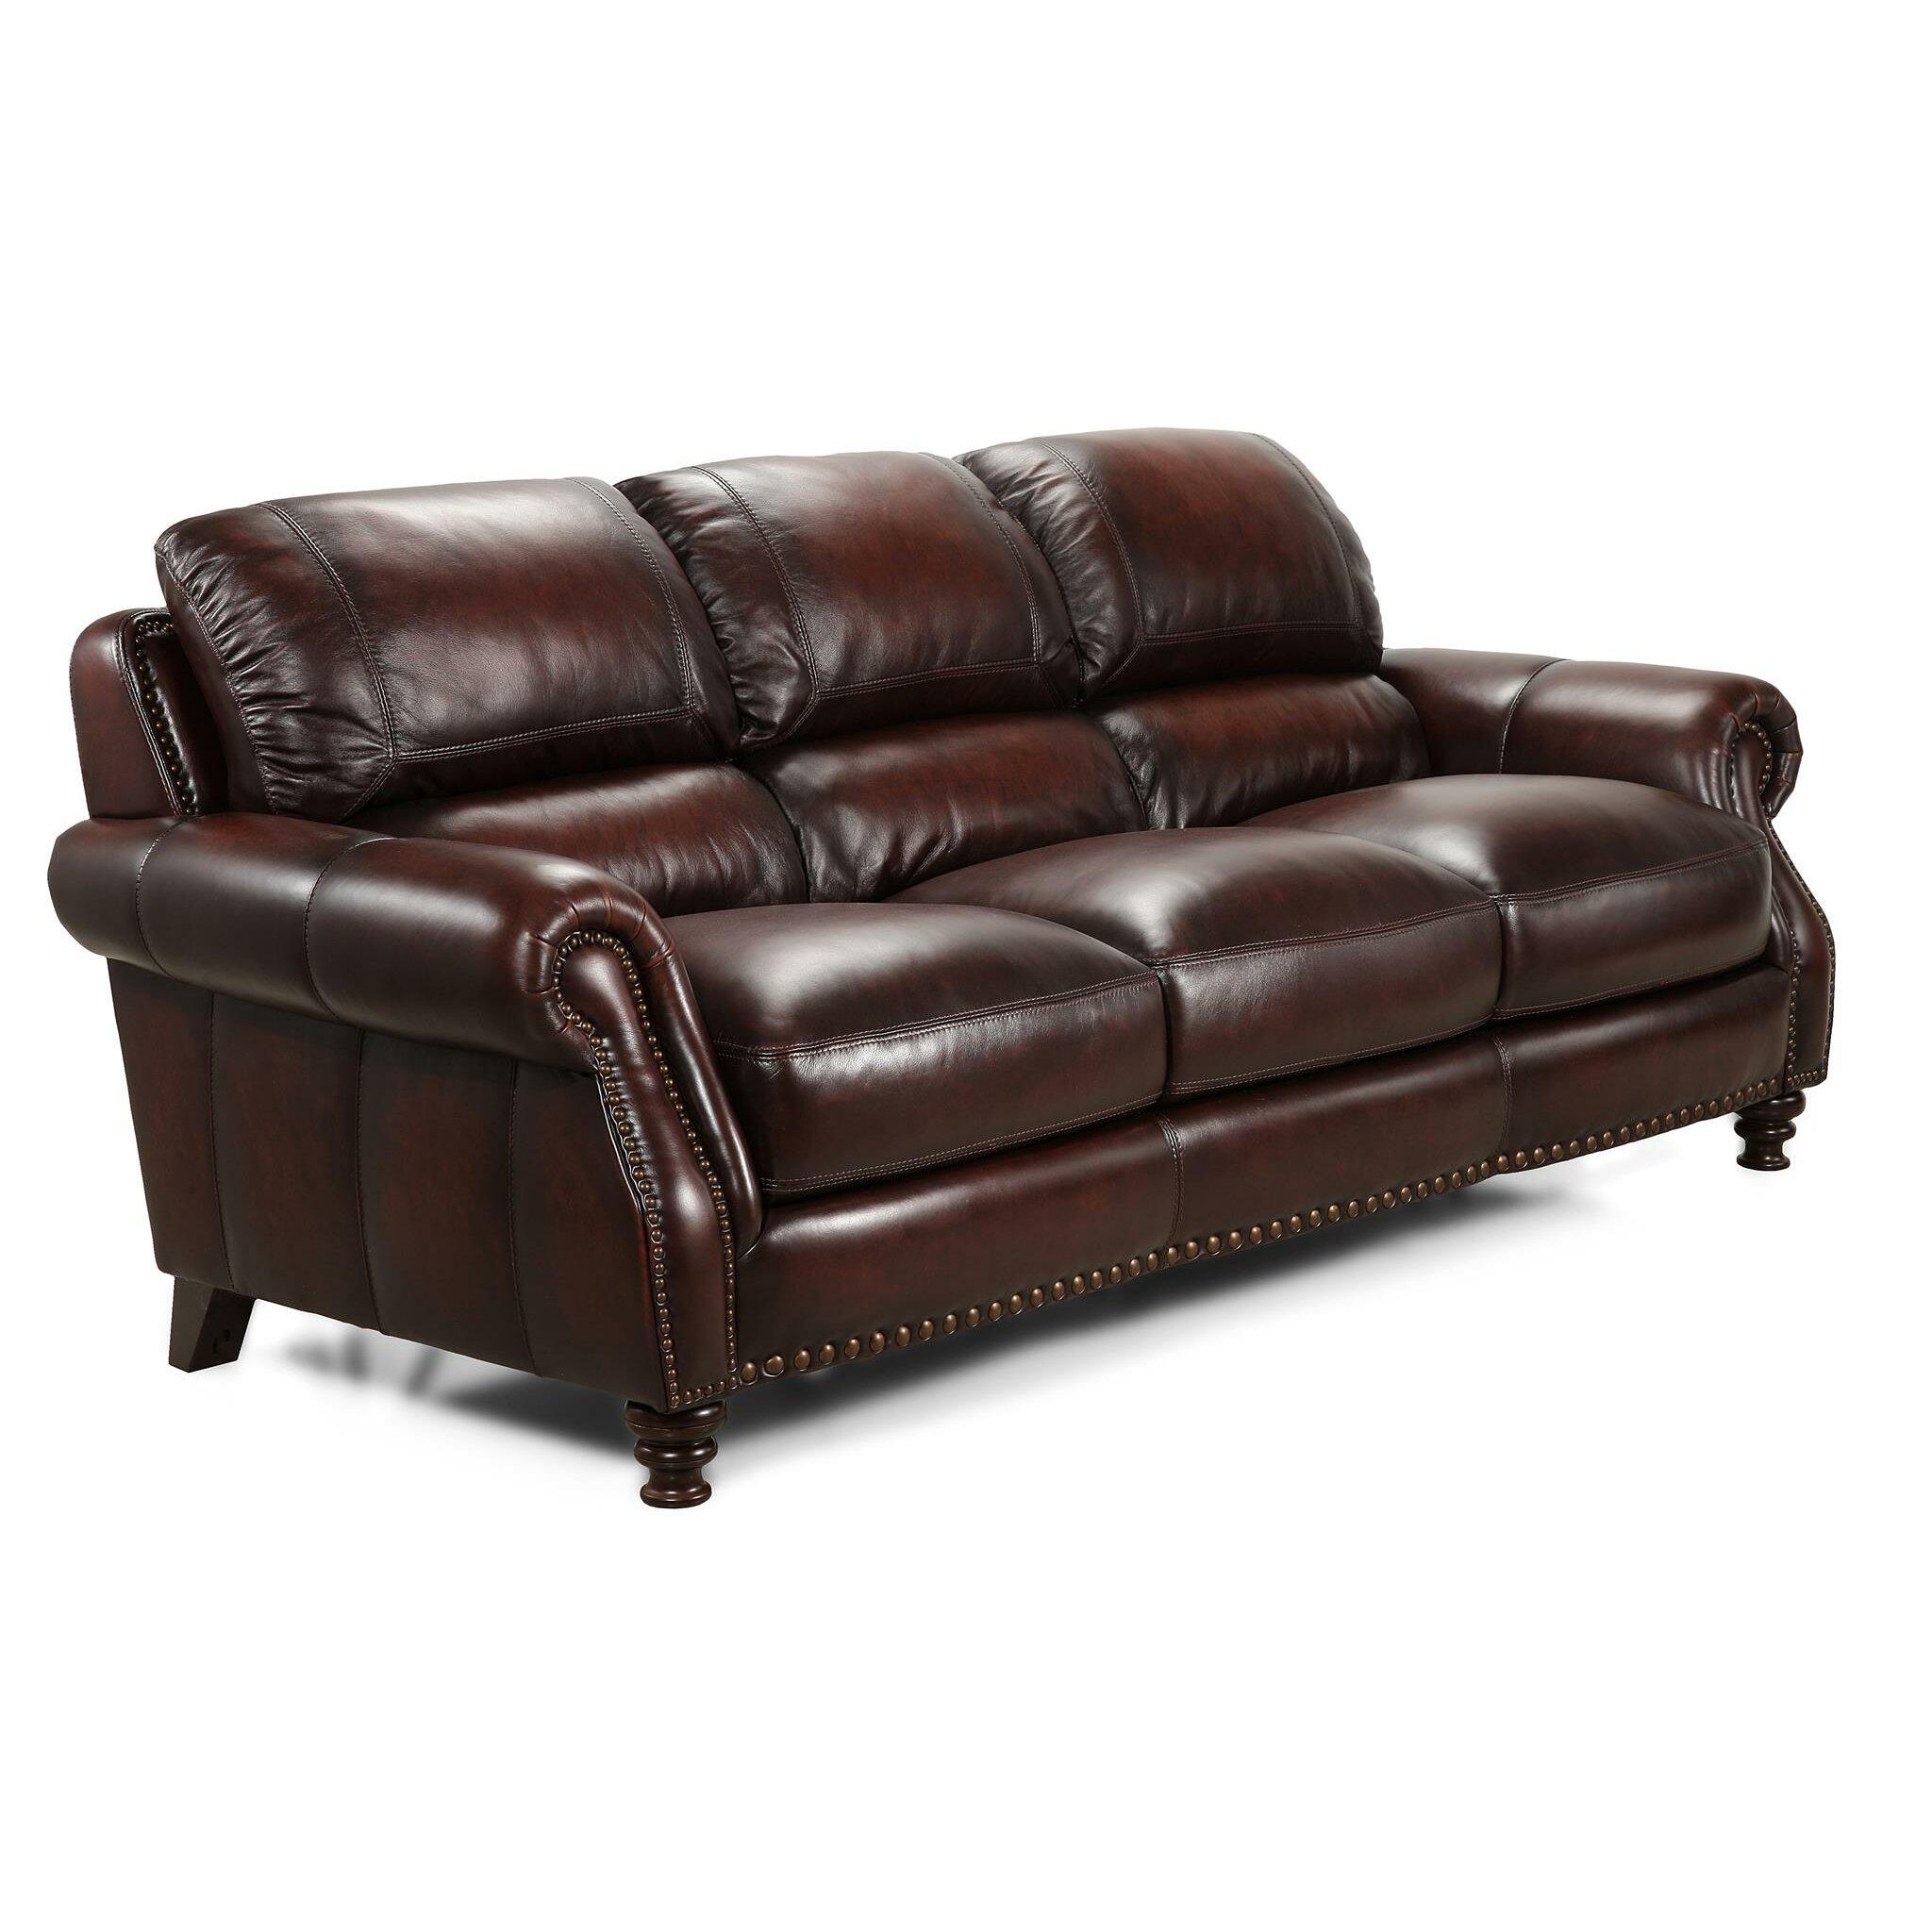 Sofa on credit no credit check furniture financing fair for Furniture 0 percent financing